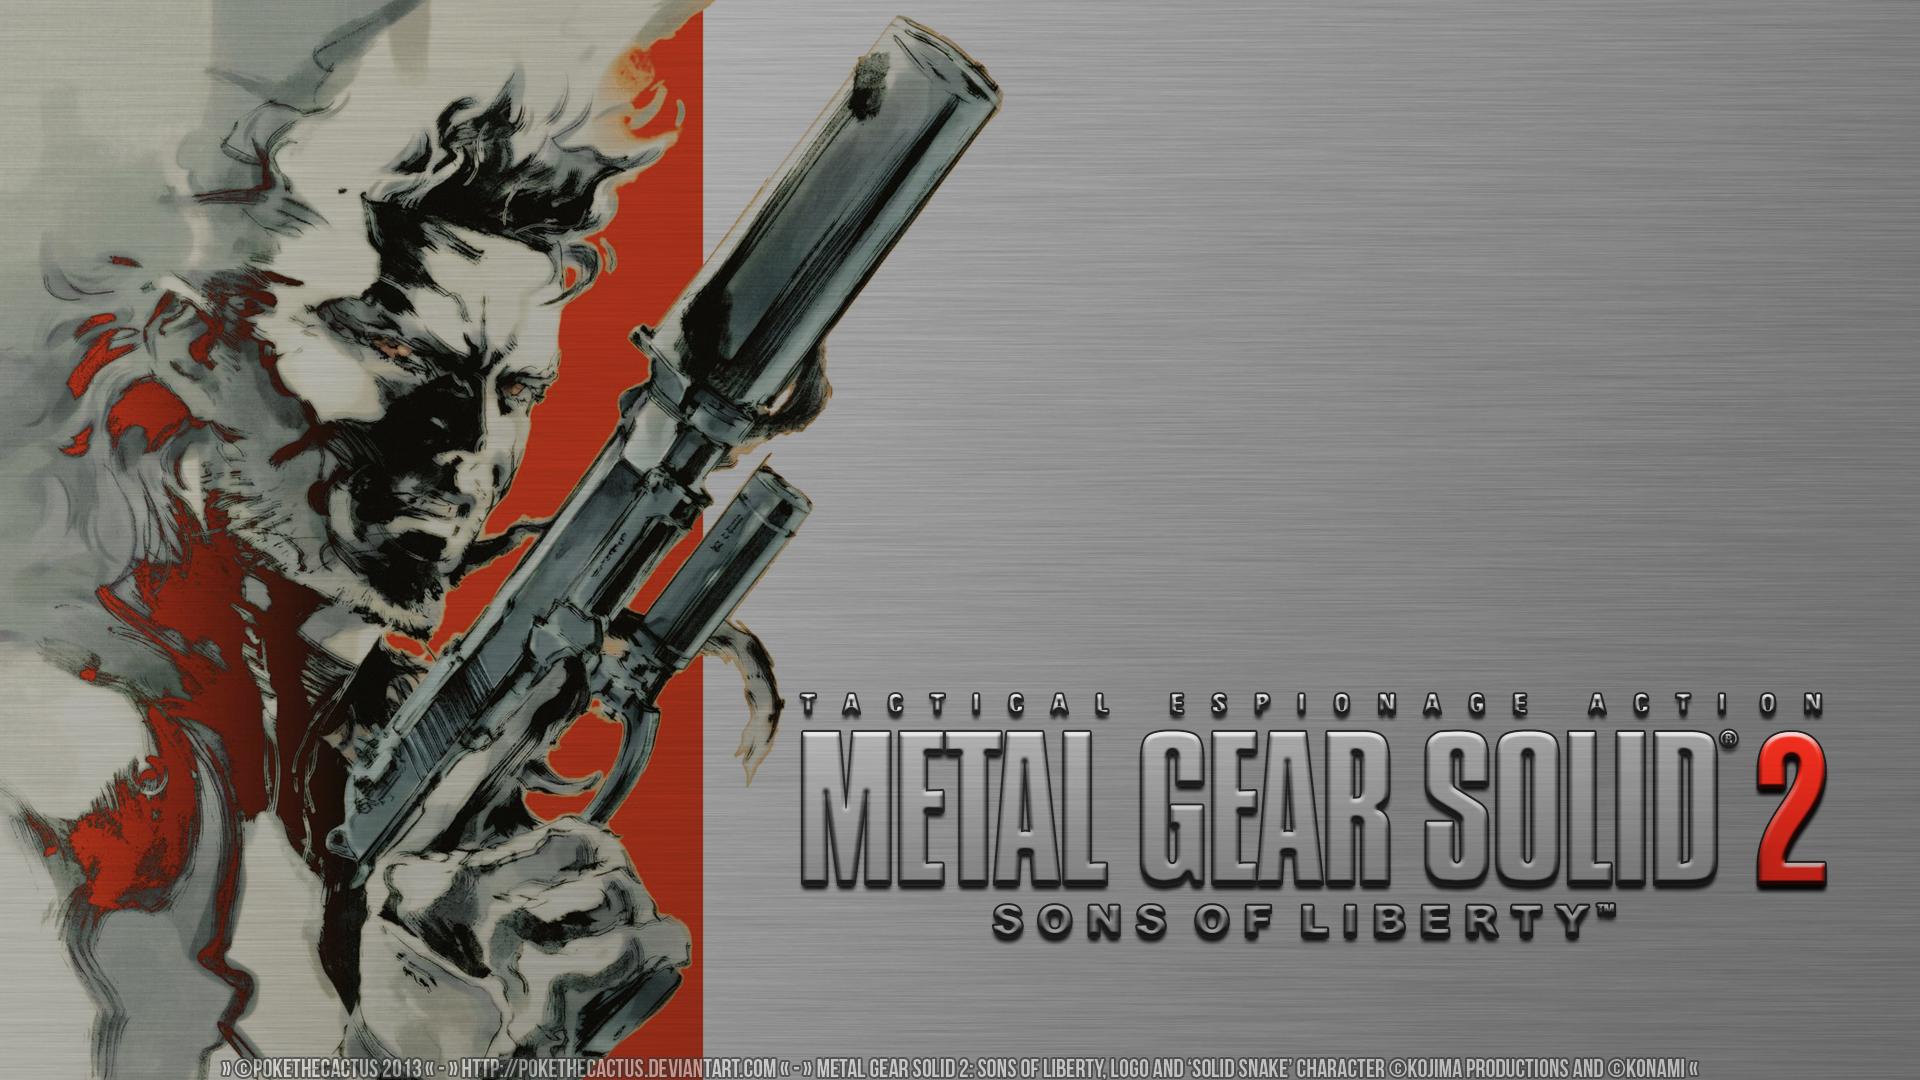 Metal Gear Solid 2 Wallpaper: Metal Gear Solid 2 HD Wallpaper By PokeTheCactus